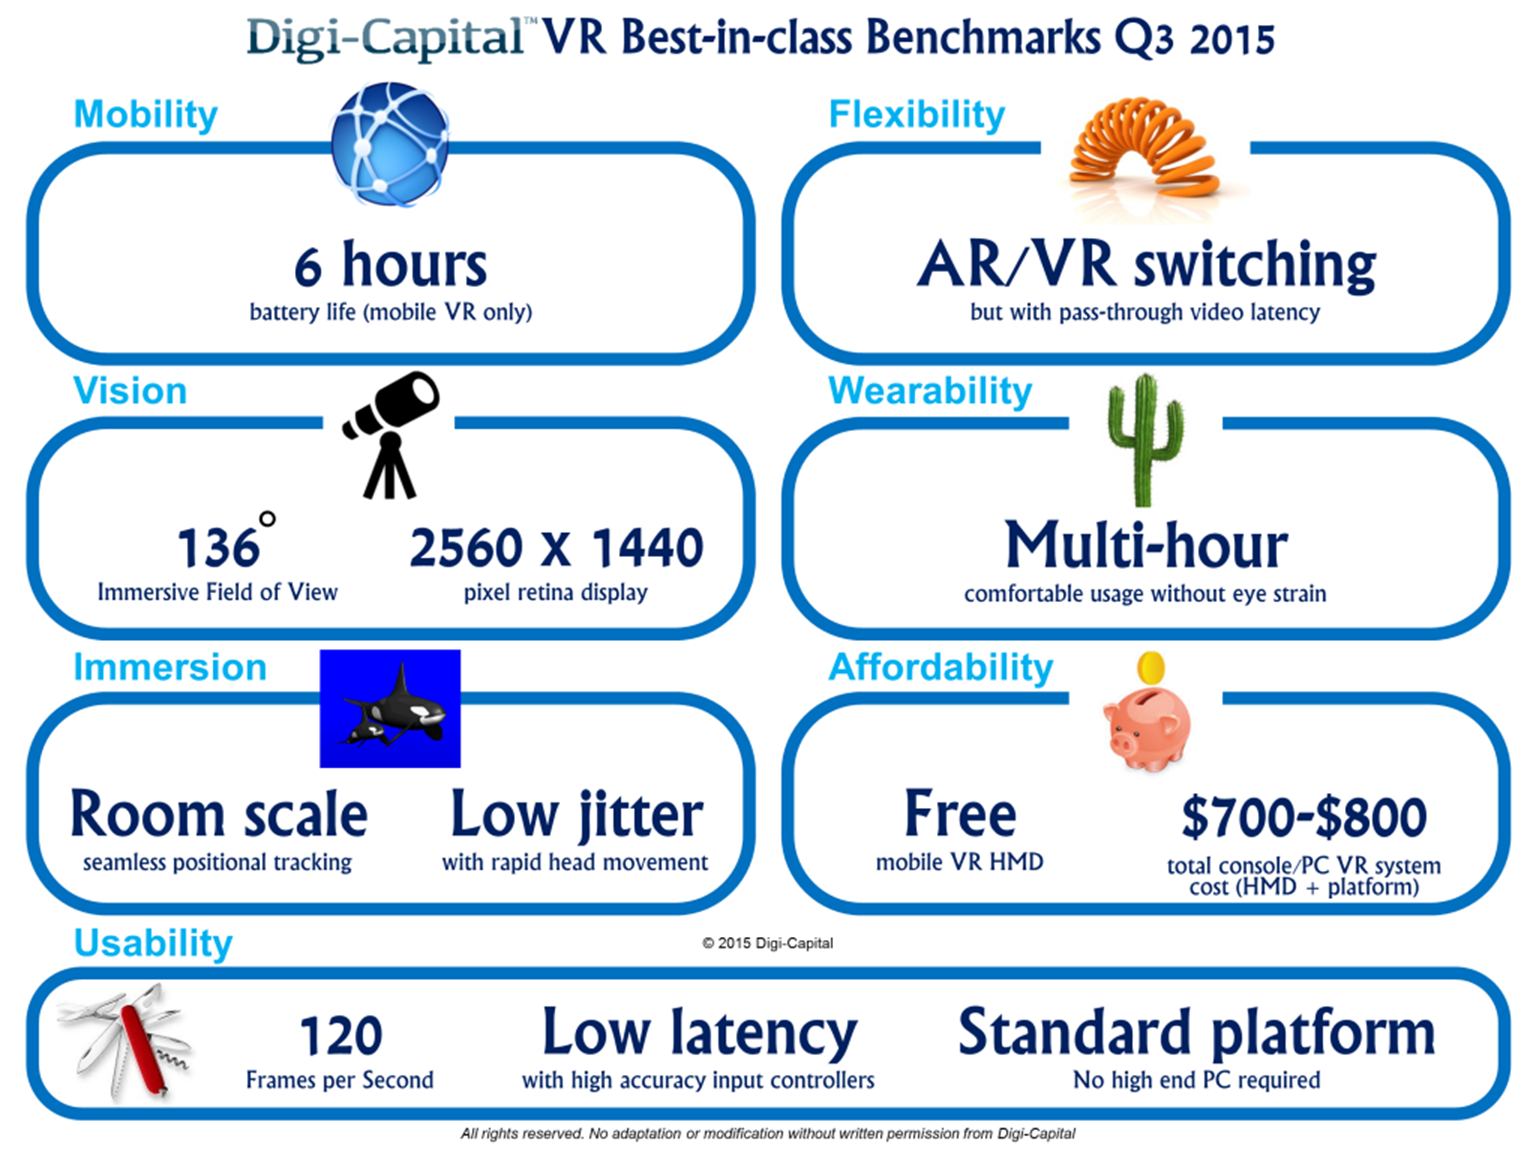 Digi-Capital VR best-in-class benchmarks